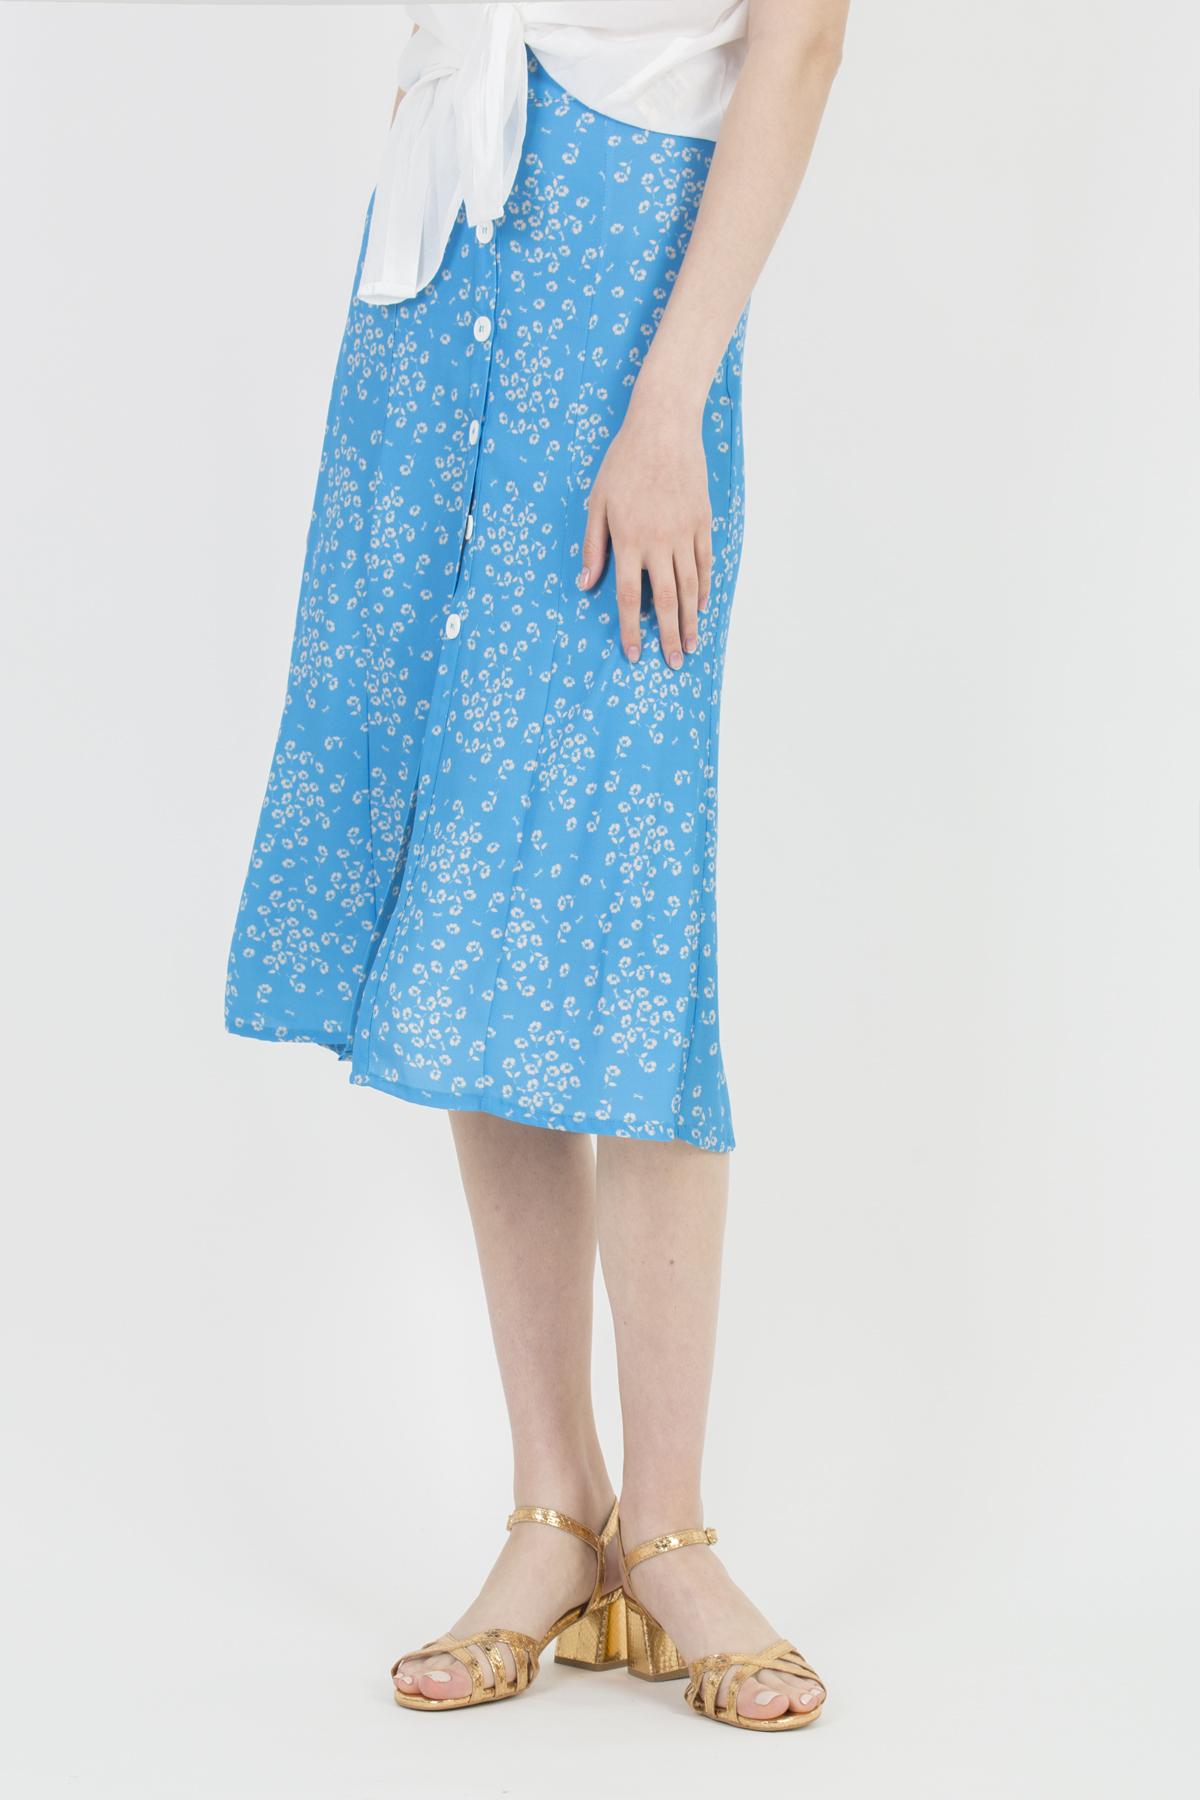 clio-skirt-high-waist-buttons-uniforme-athens-matchboxathens